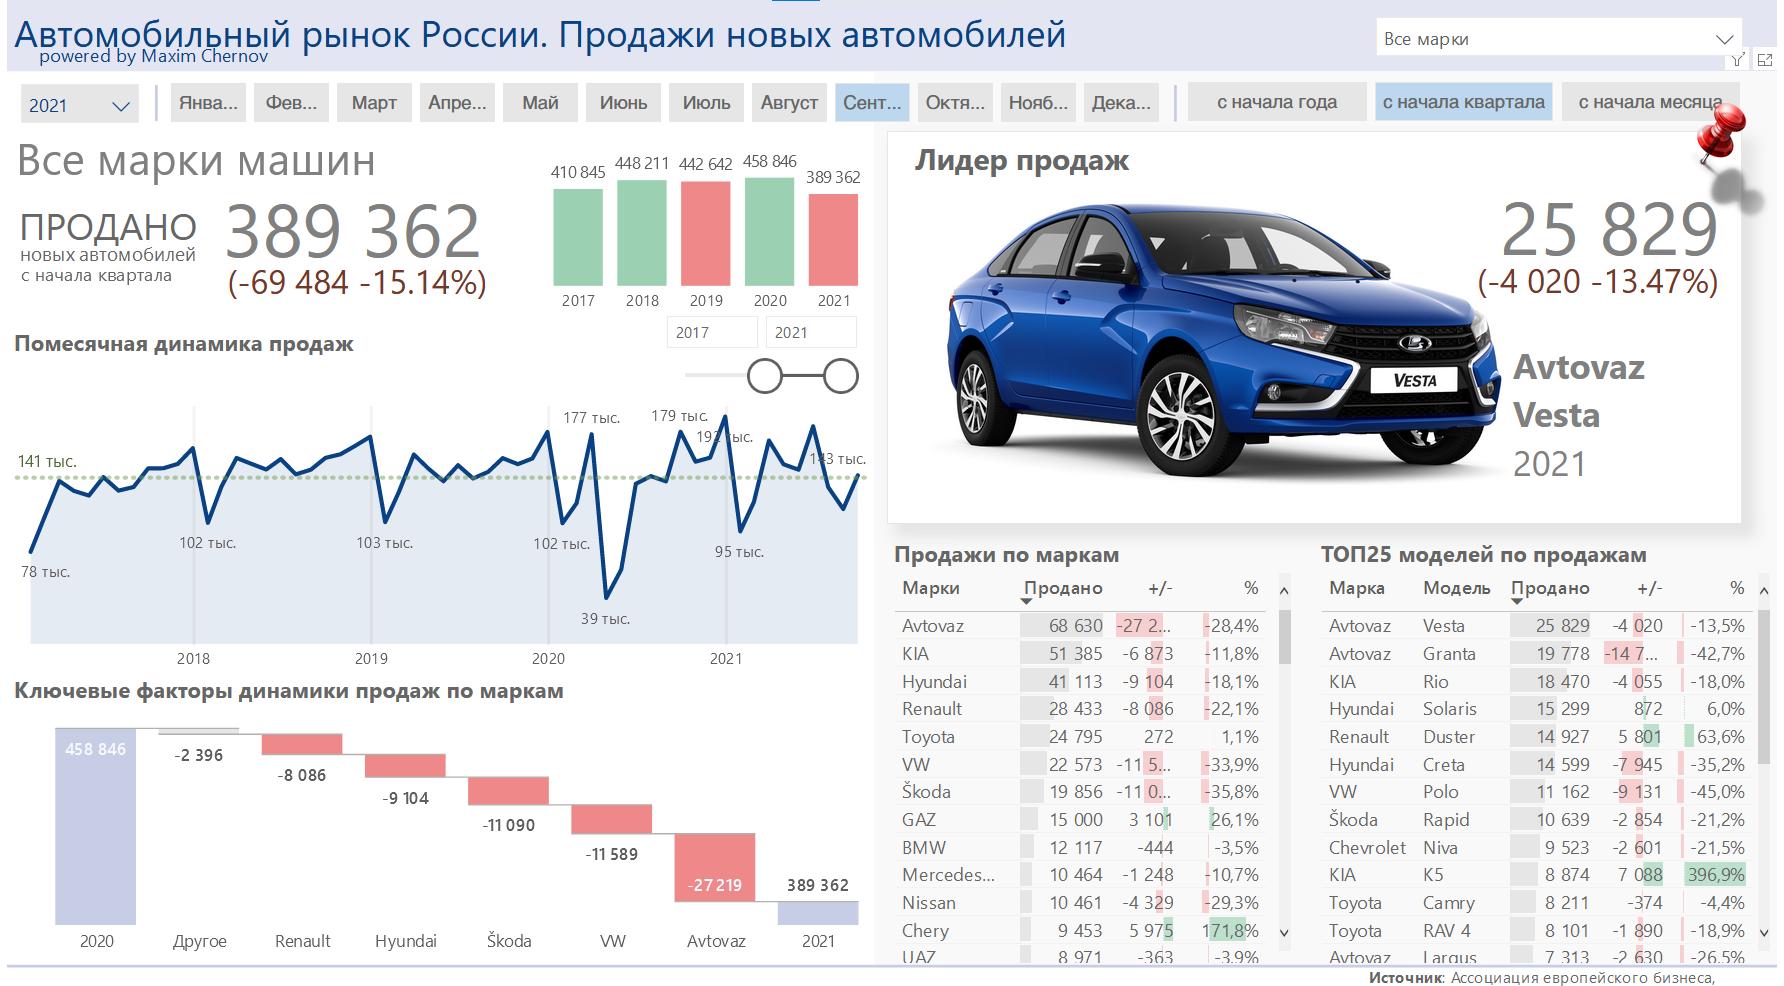 Продажи автомобилей снизились на 20%